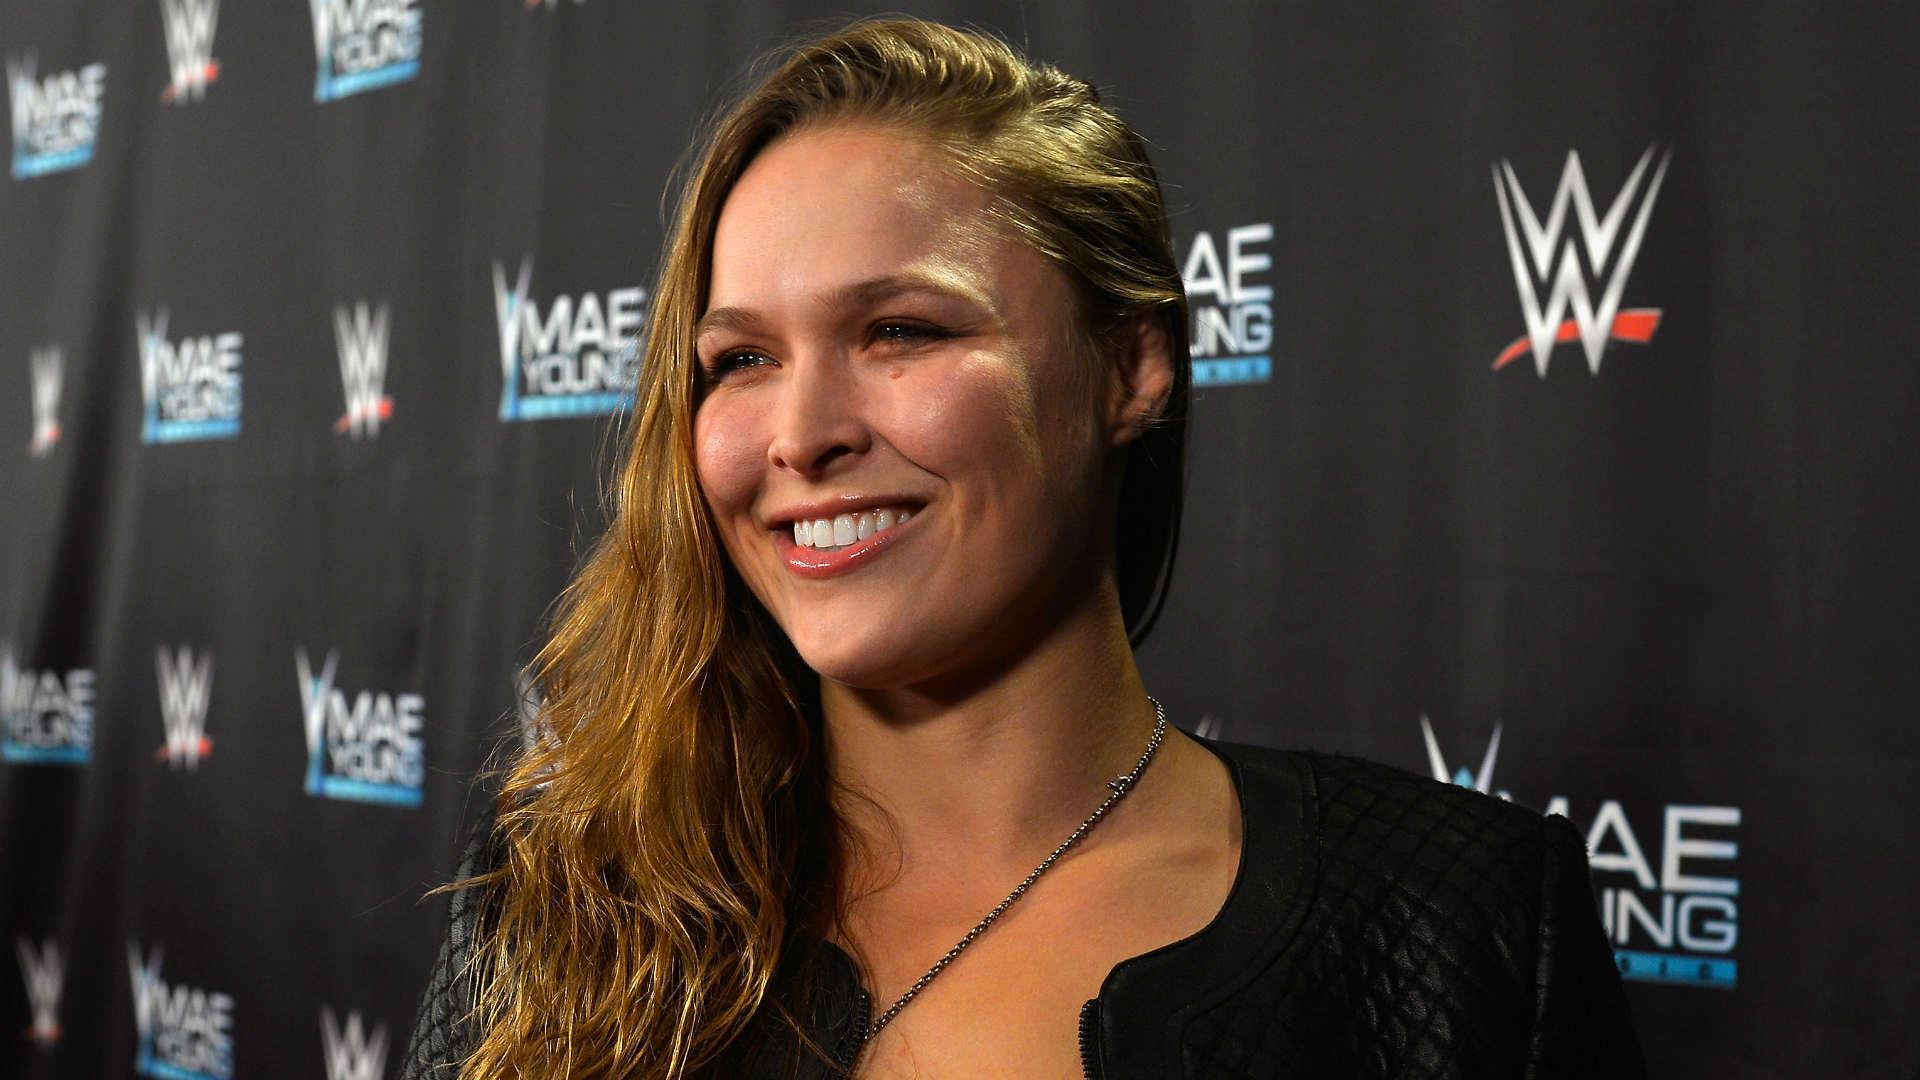 Ronda-Rousey-012818-USNews-Getty-FTR